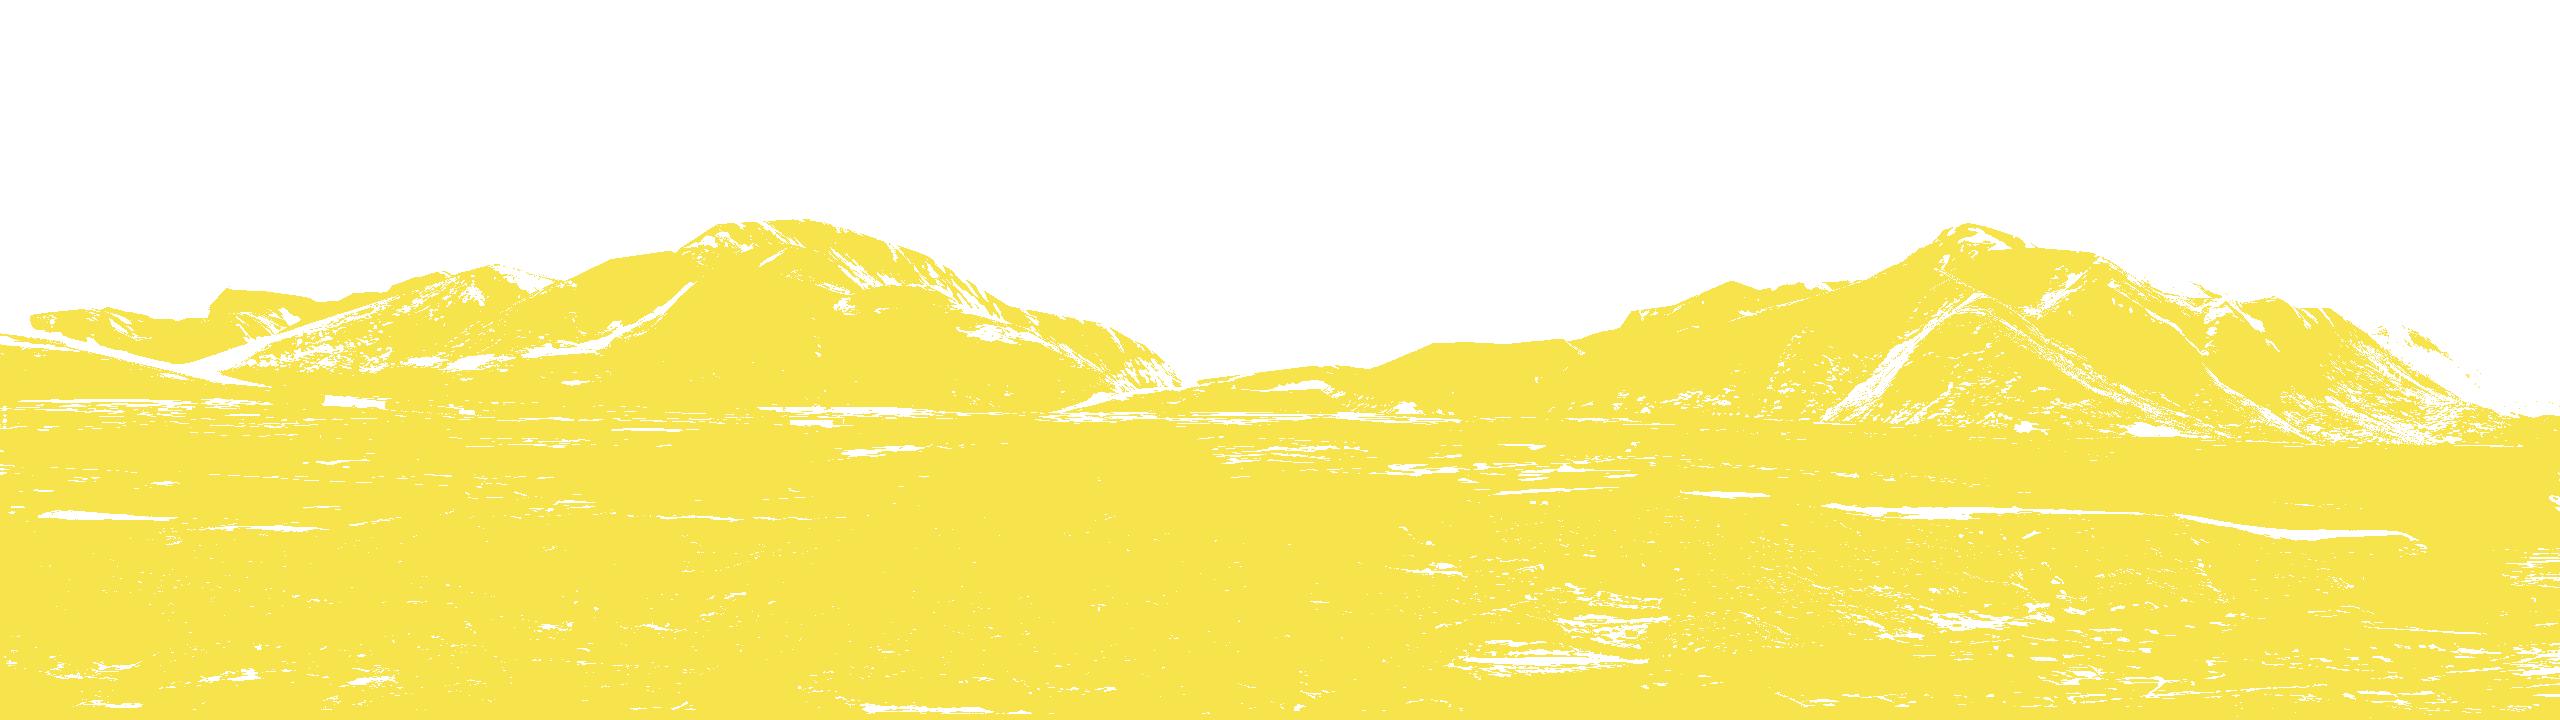 promenade_4